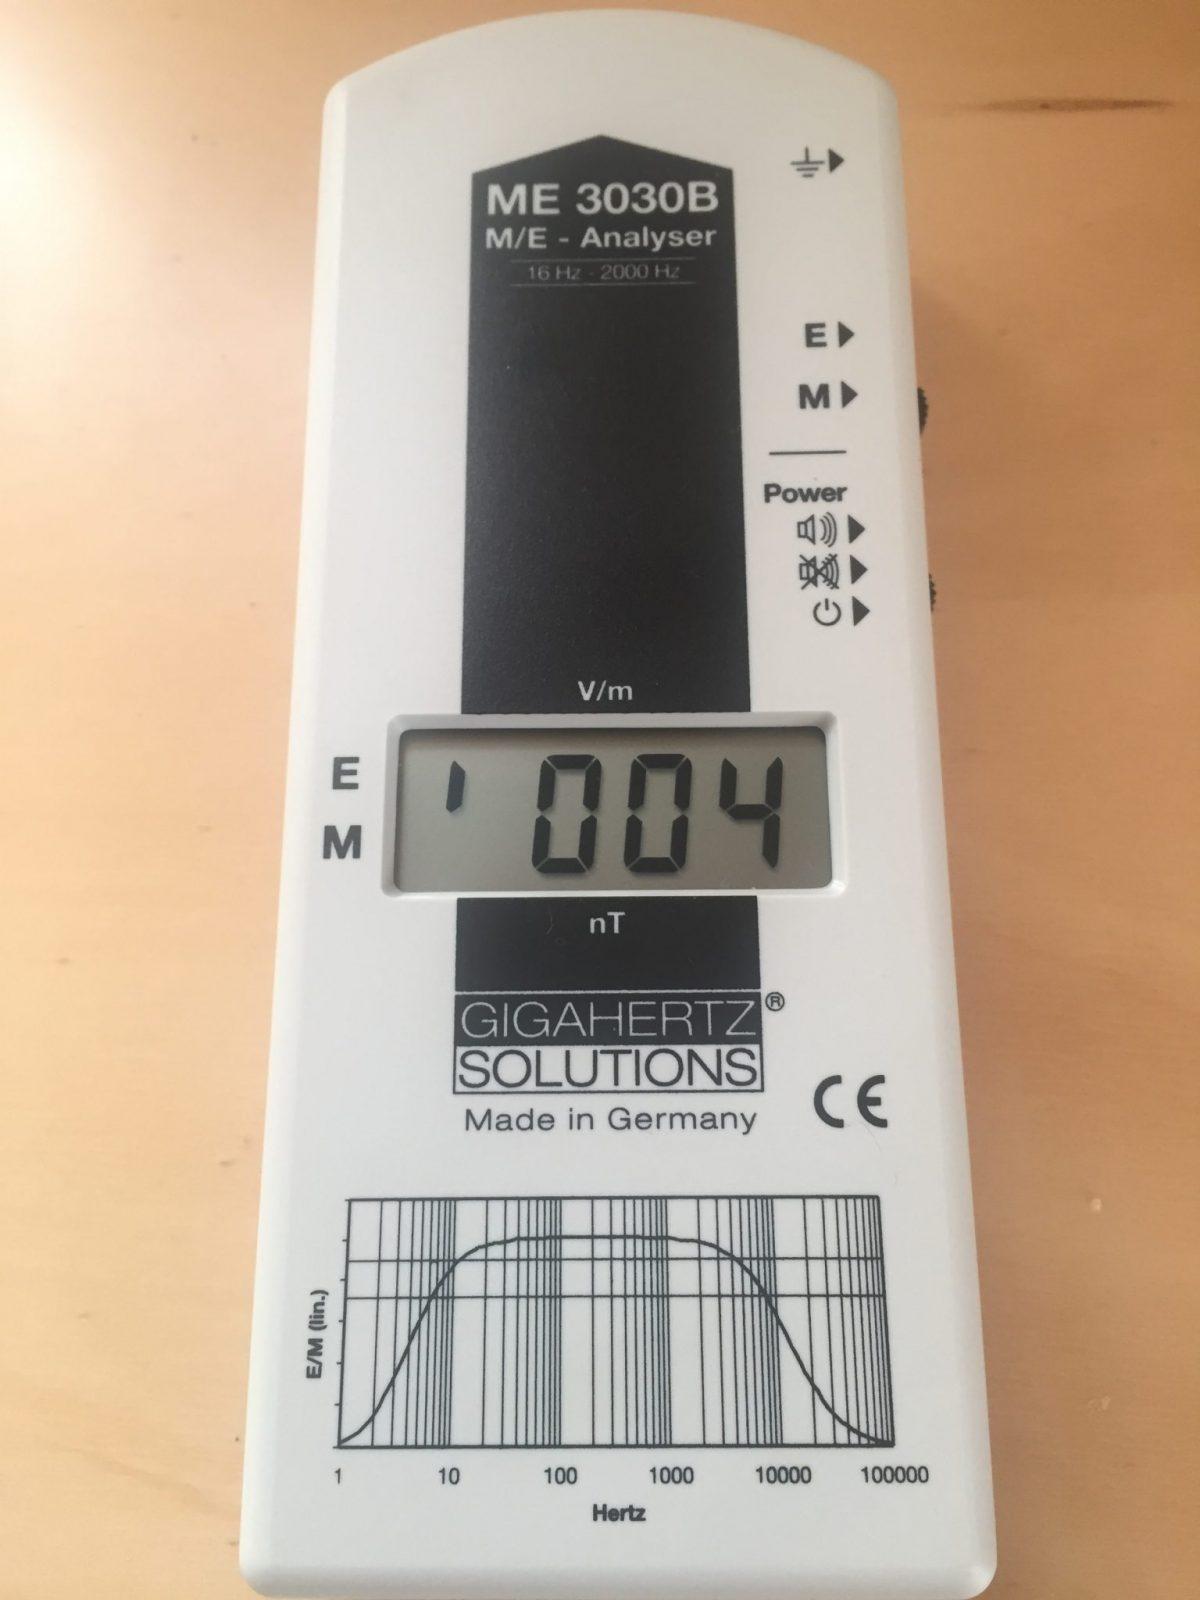 Gigahertz EMF Meter